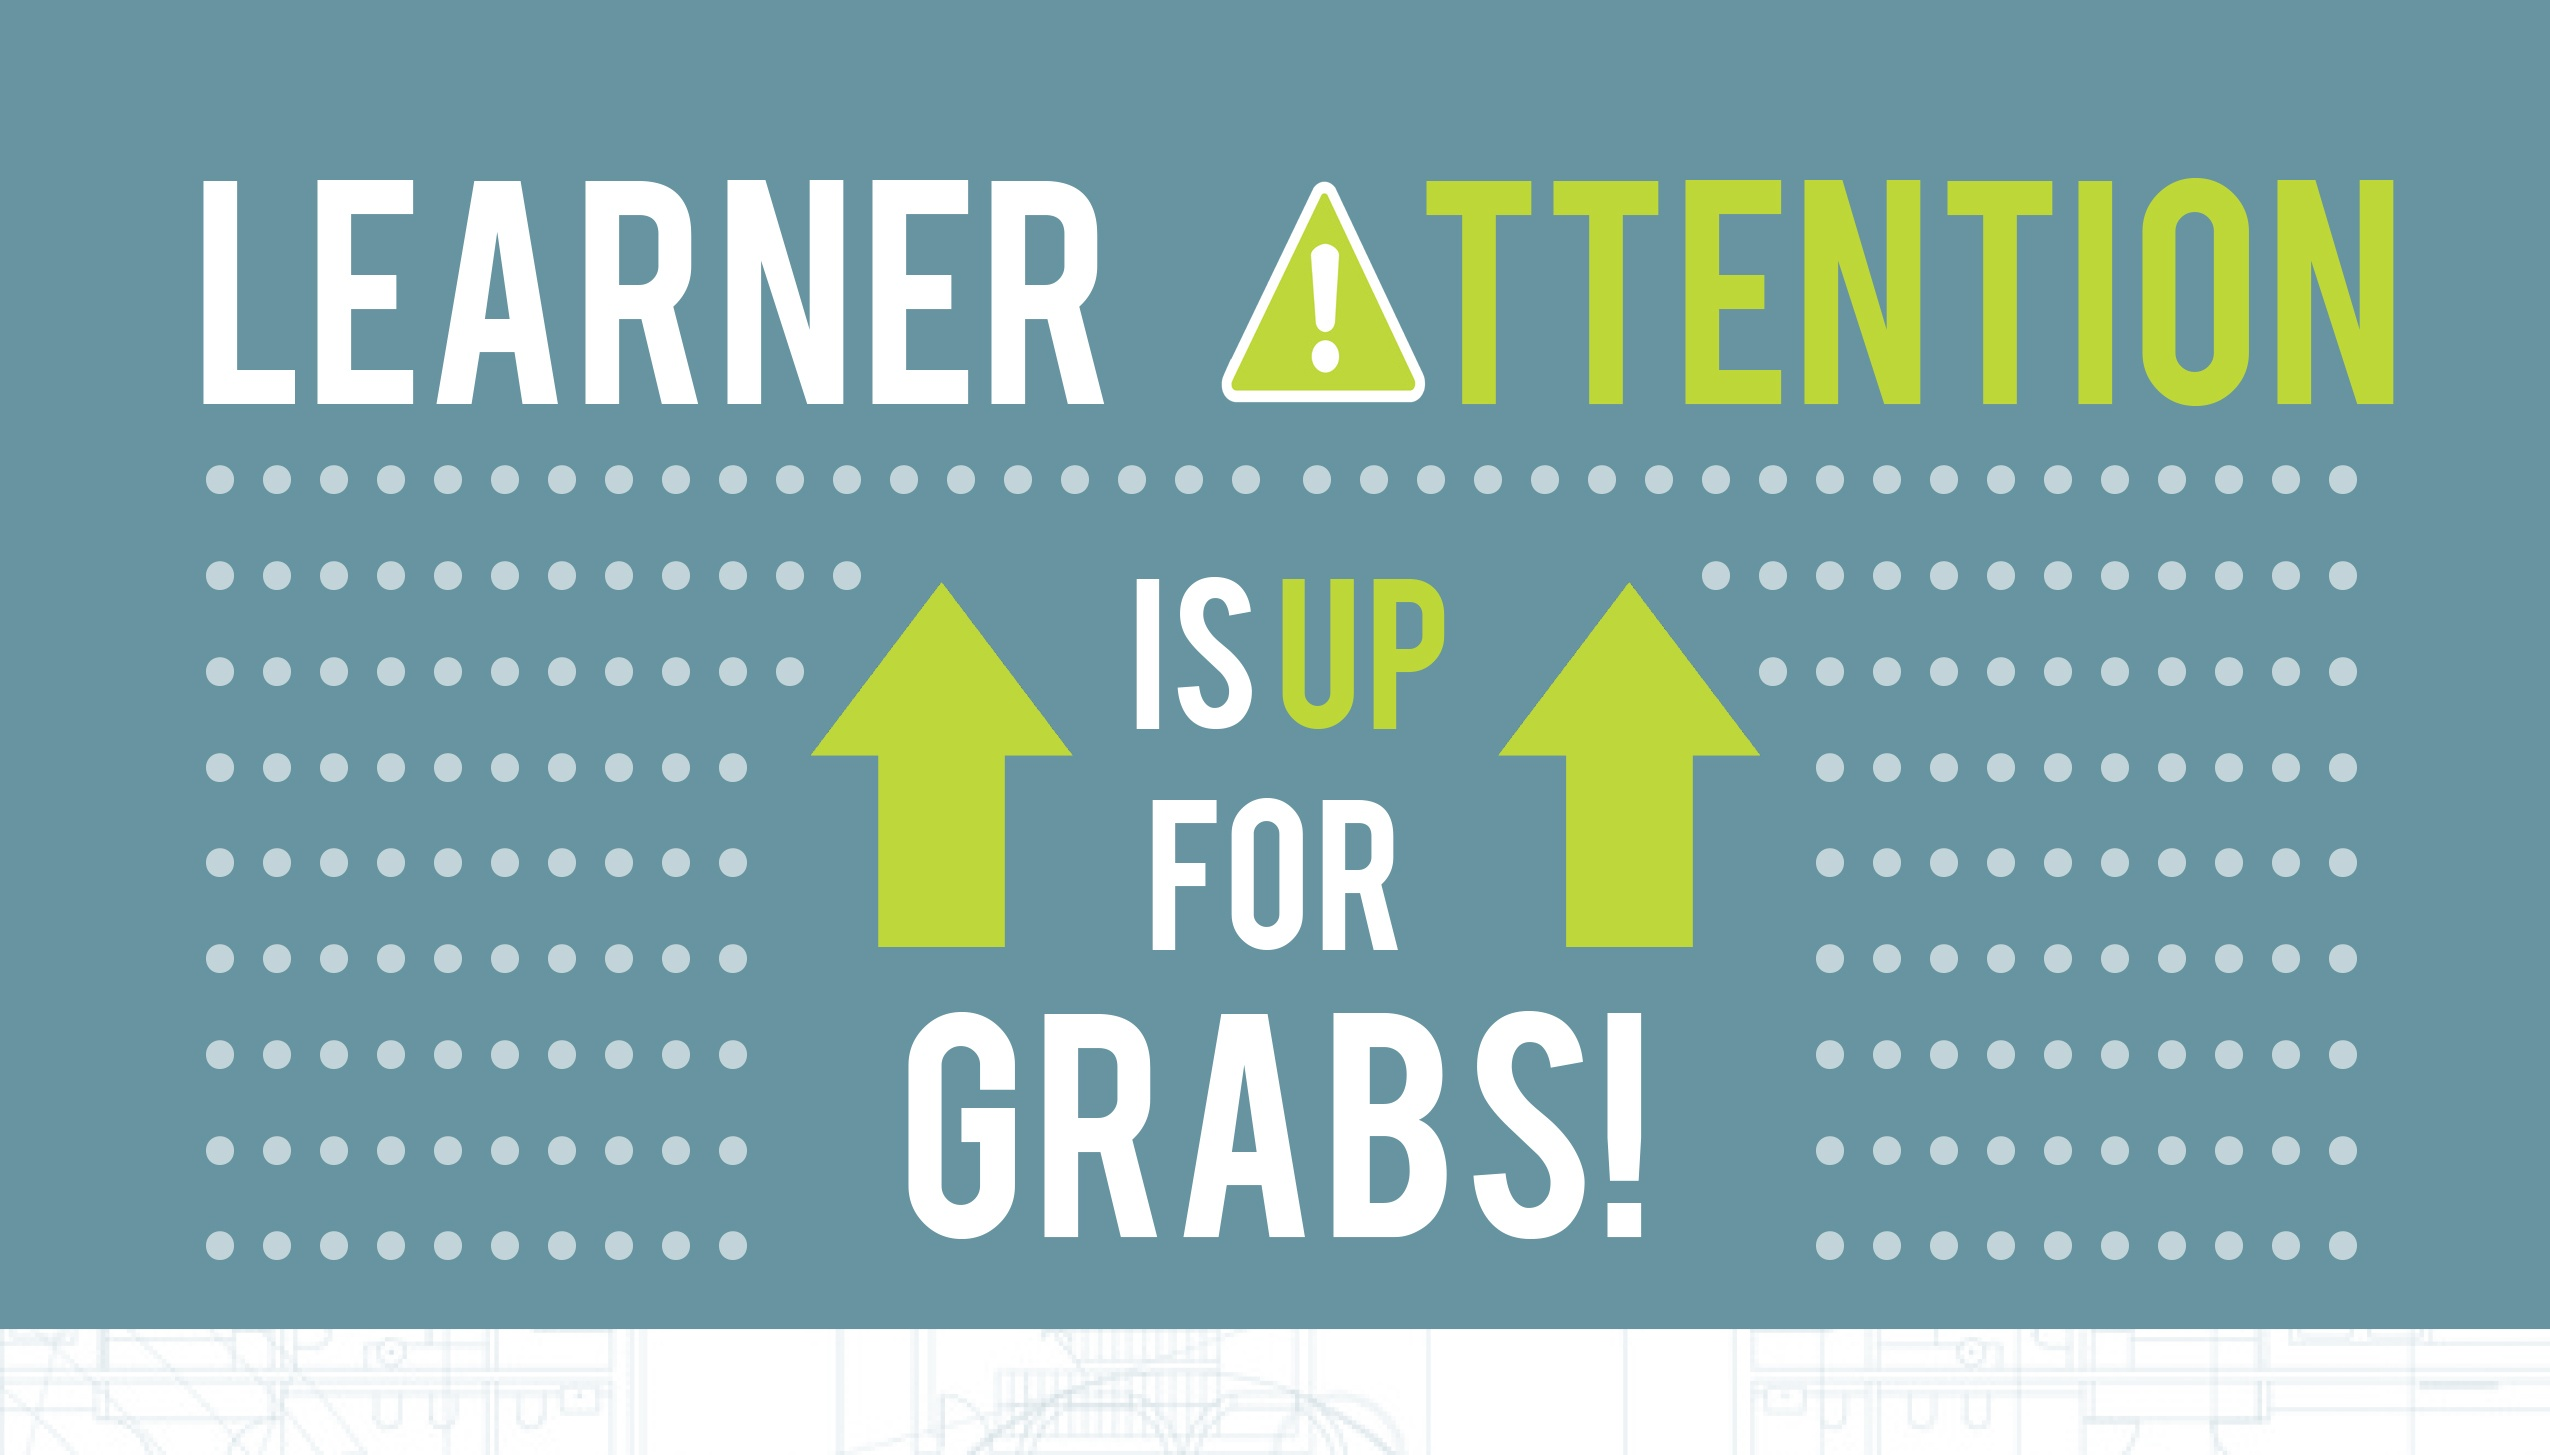 LearnerAttentionUpForGrabs_Header.jpg